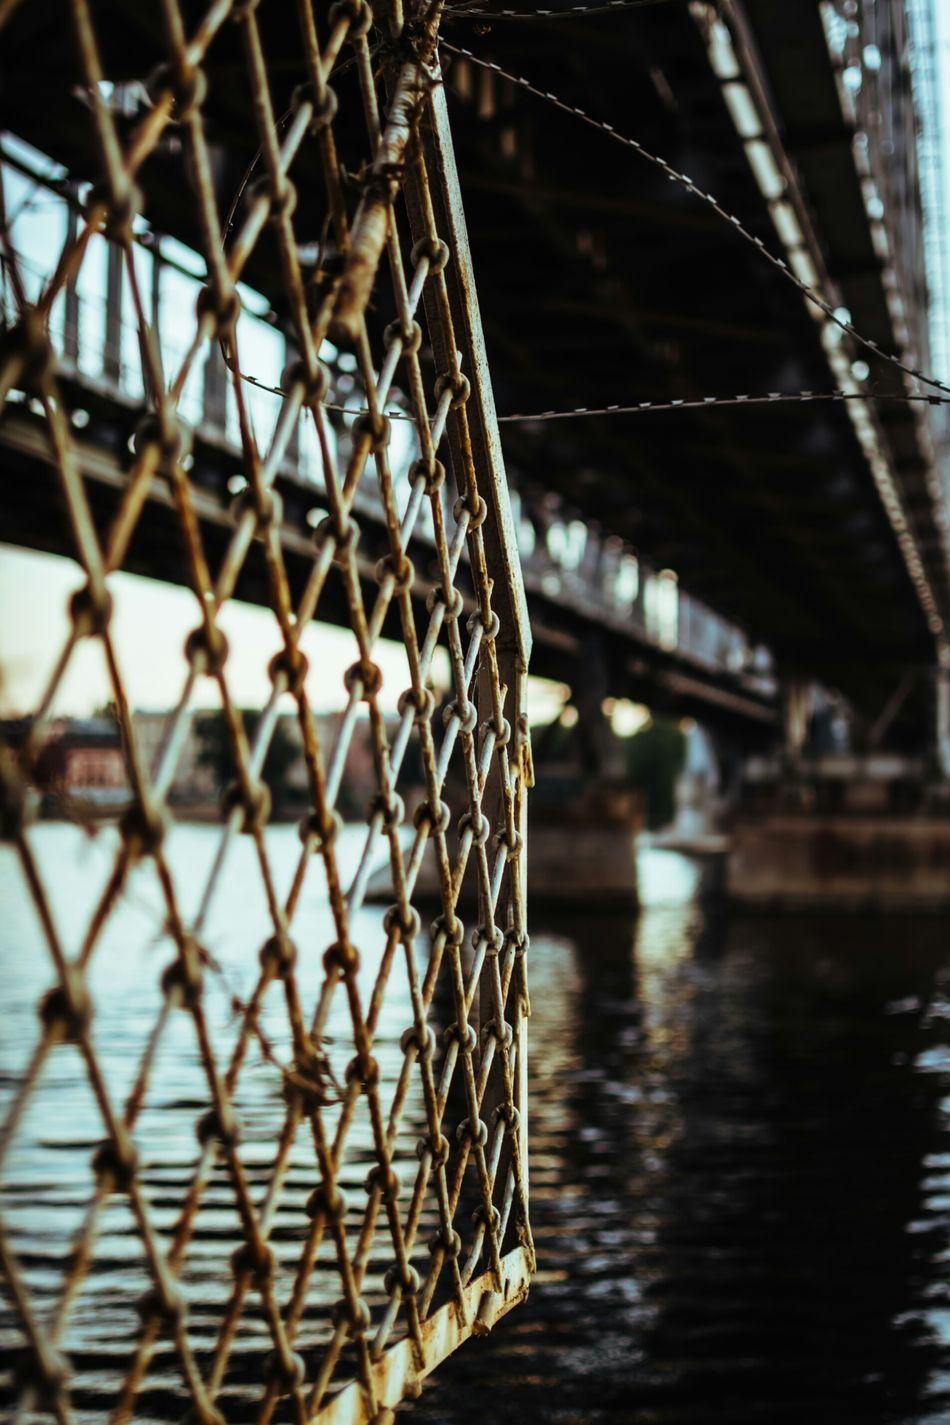 Architecture VSCO Cam Cityscapes City Bridge Bridges Spb Urbanexploration